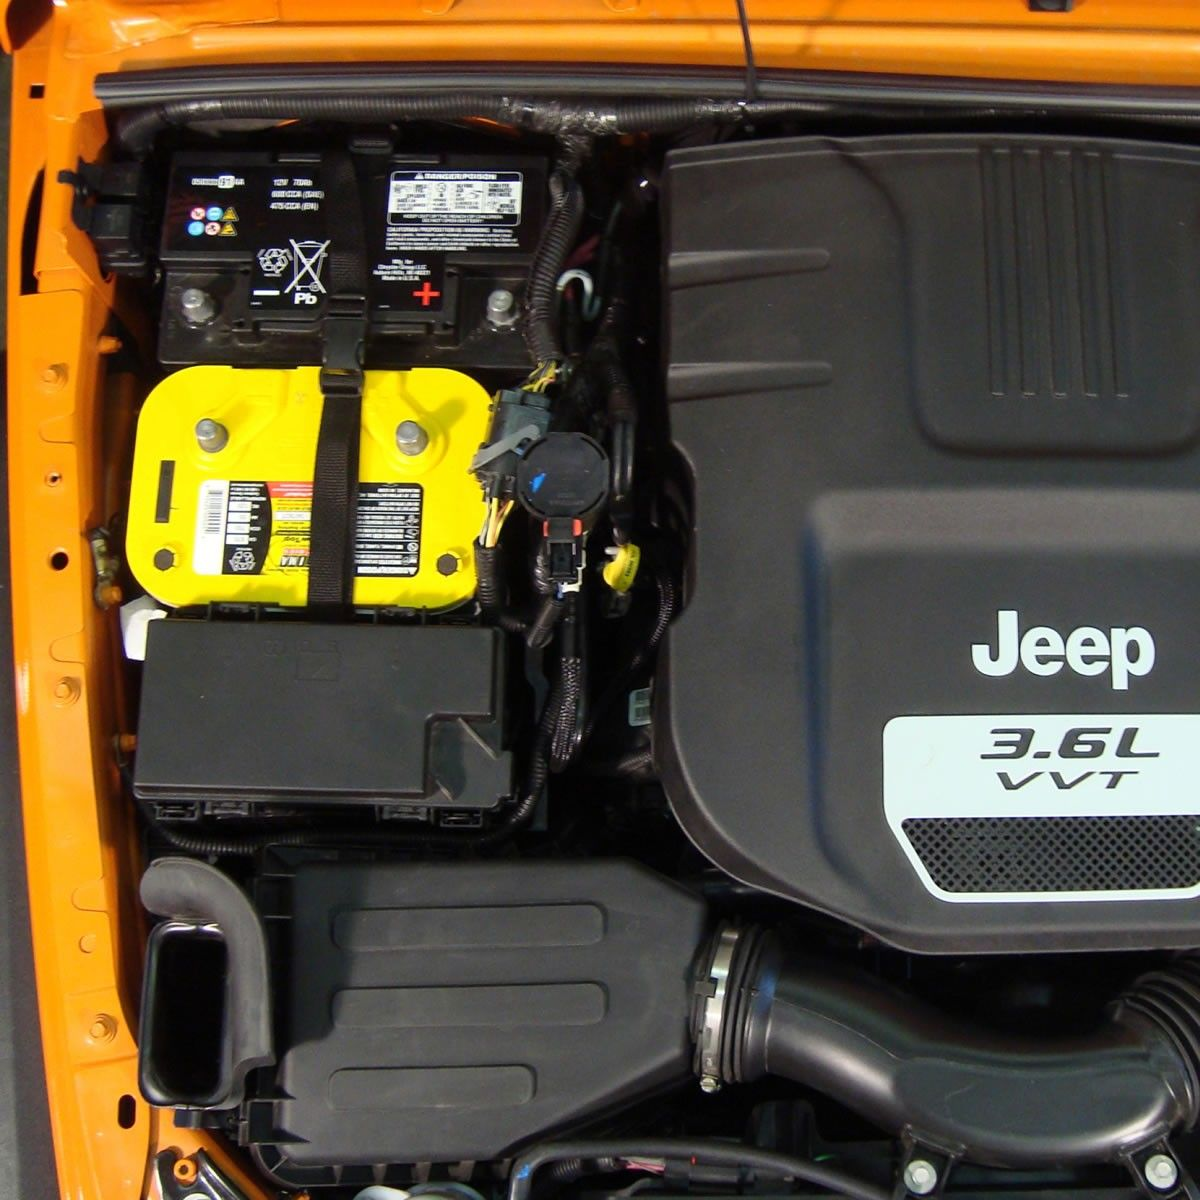 MORE Dual Battery Tray, Jeep Wrangler JK 2012-2016